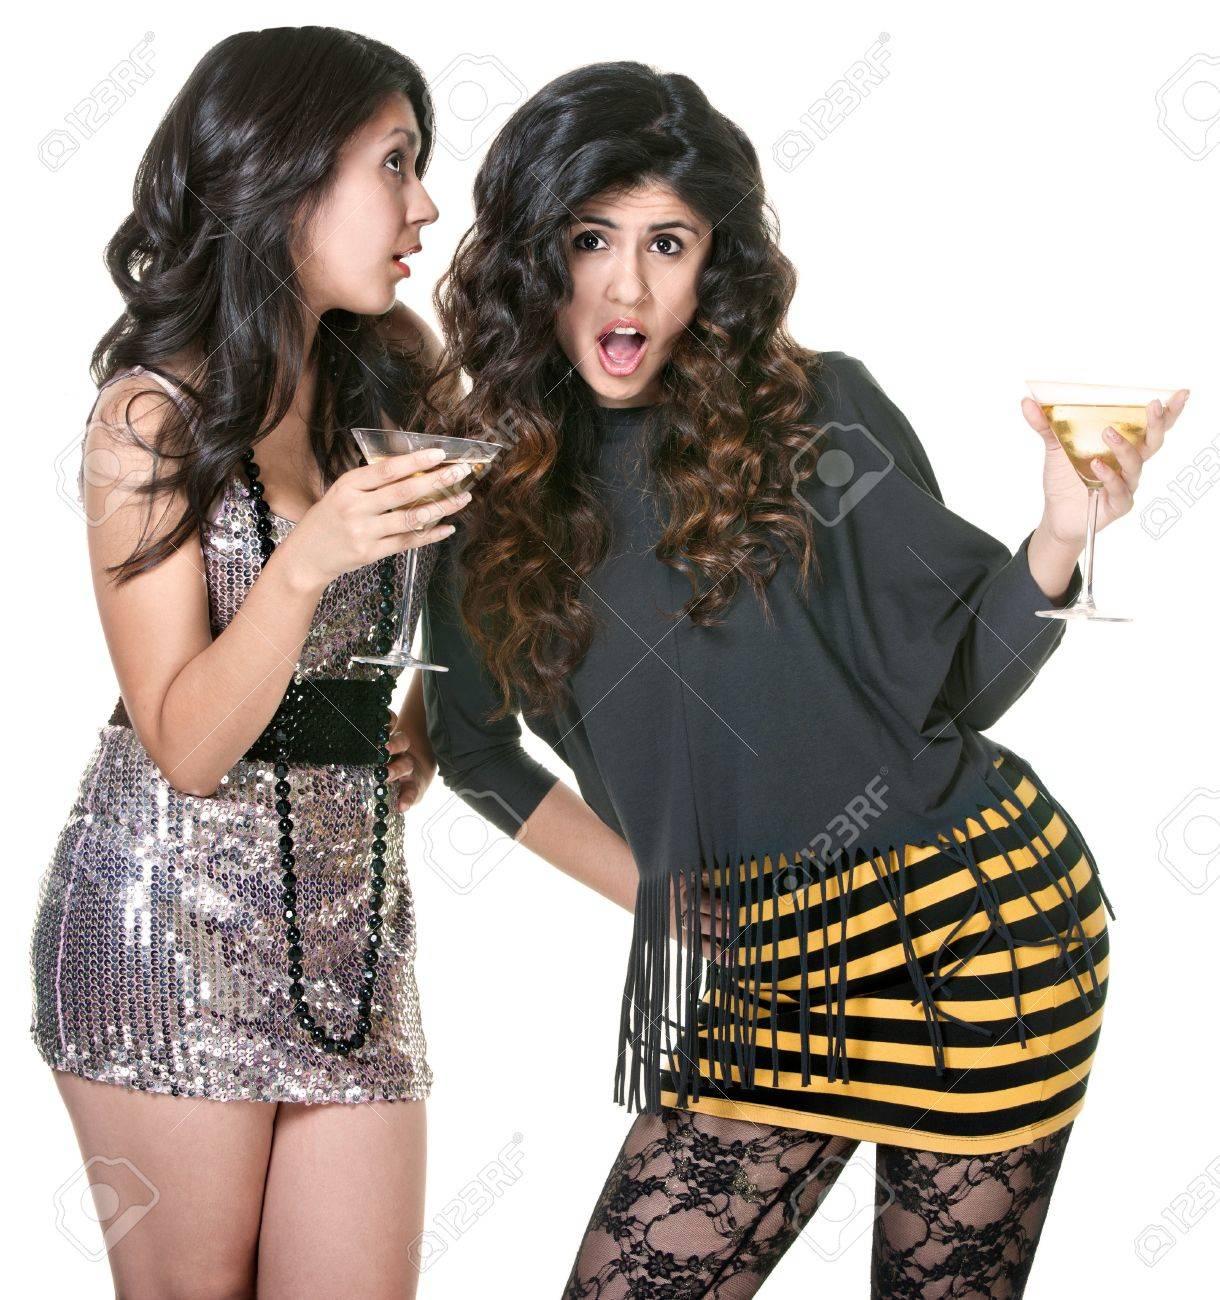 Surprised club girl listening to friend telling secrets Stock Photo - 18123501